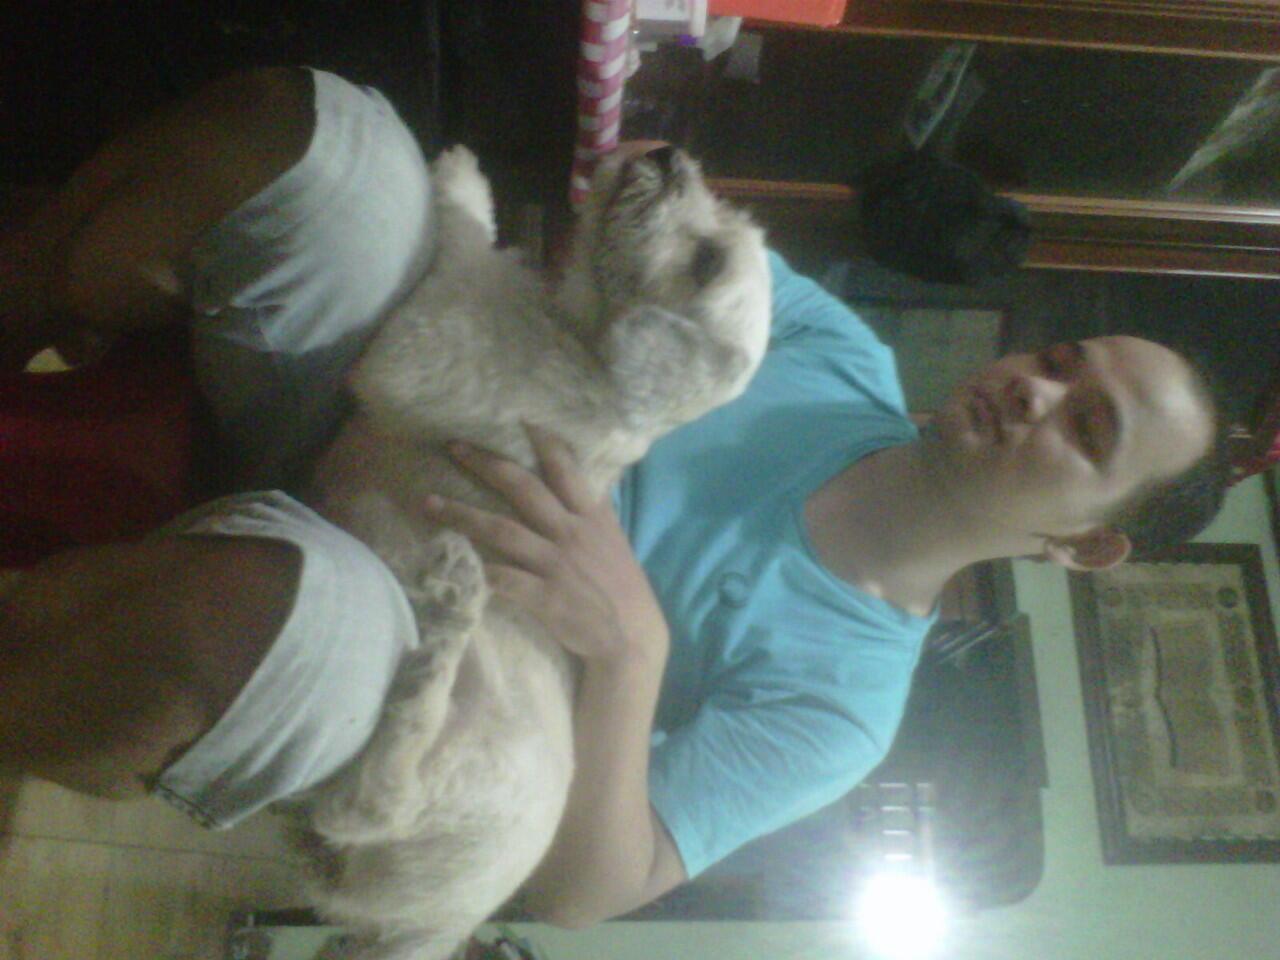 puppy maltese-shih tzu usia 3 bulan (28 agust 2012) dan induknya usia 2 tahun.